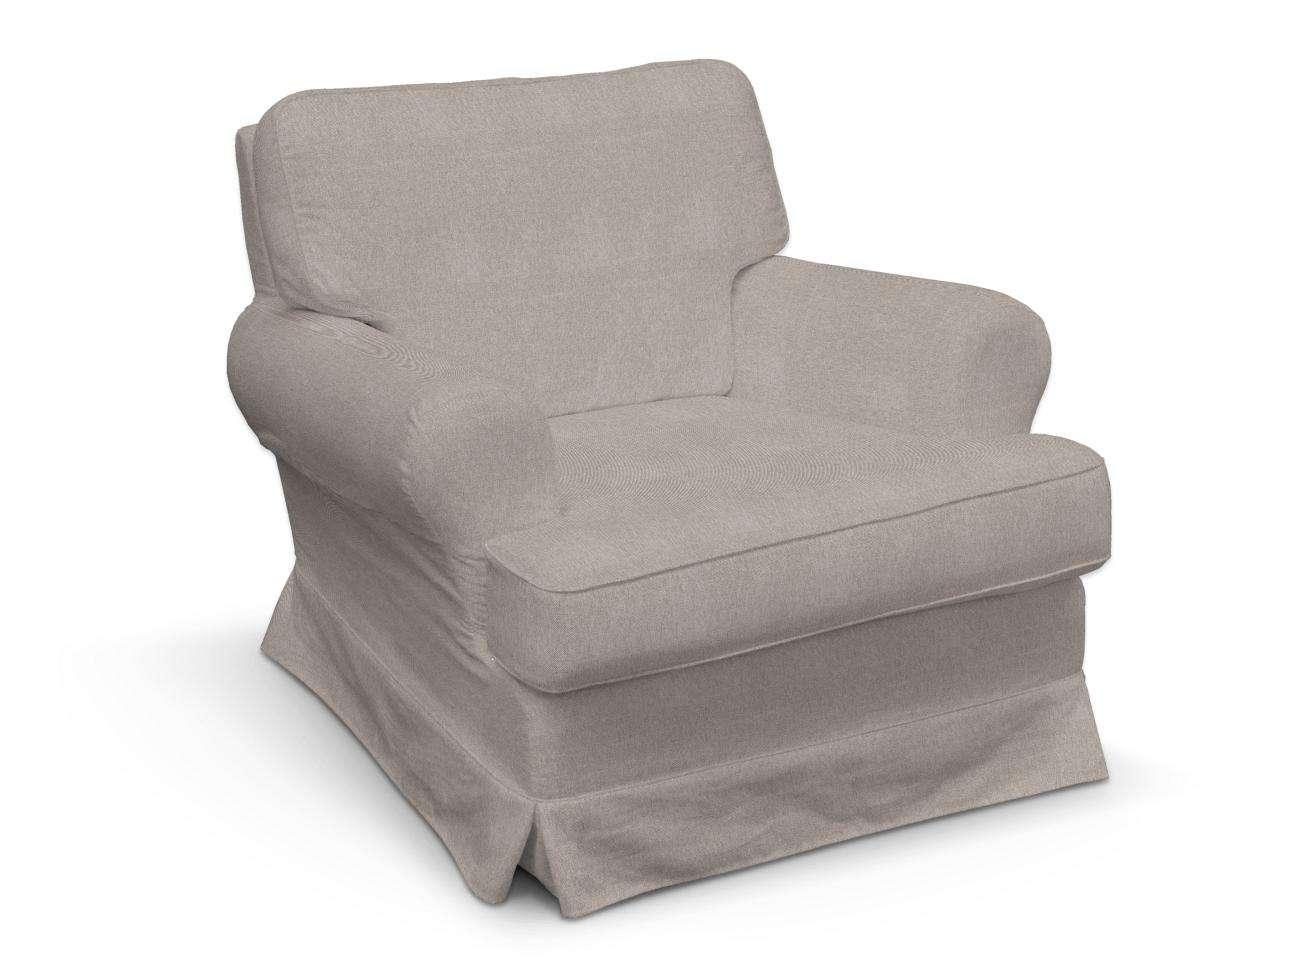 Barkaby Sesselbezug von der Kollektion Etna, Stoff: 705-09